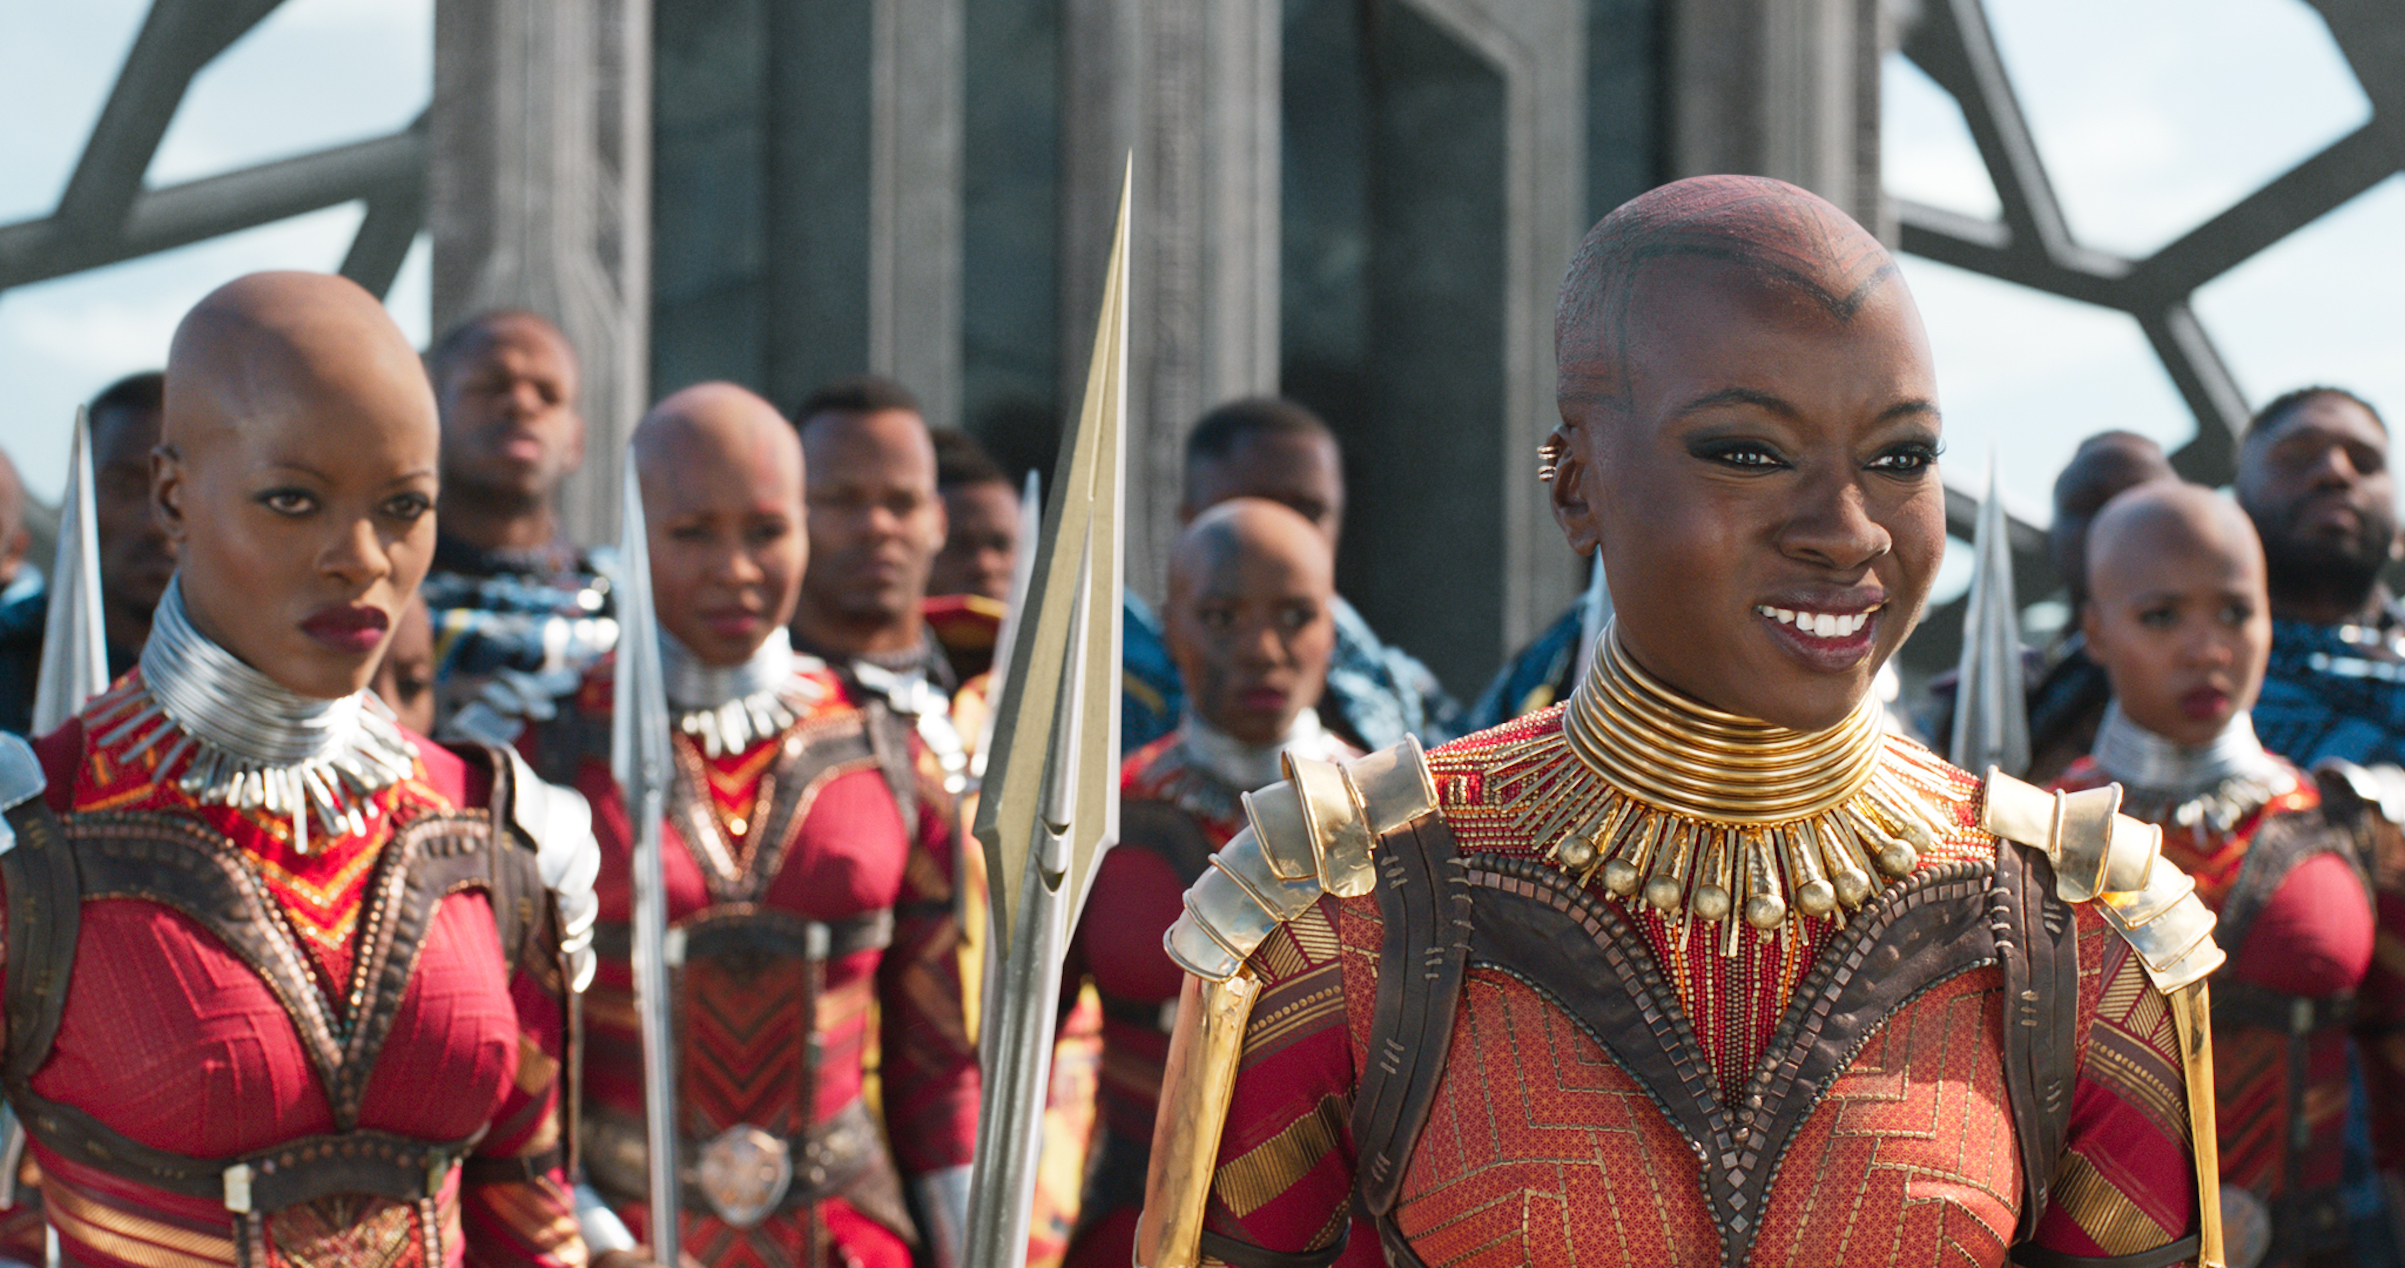 Marvel Studios' BLACK PANTHER. L to R: Ayo (Florence Kasumba) and Okoye (Danai Gurira).